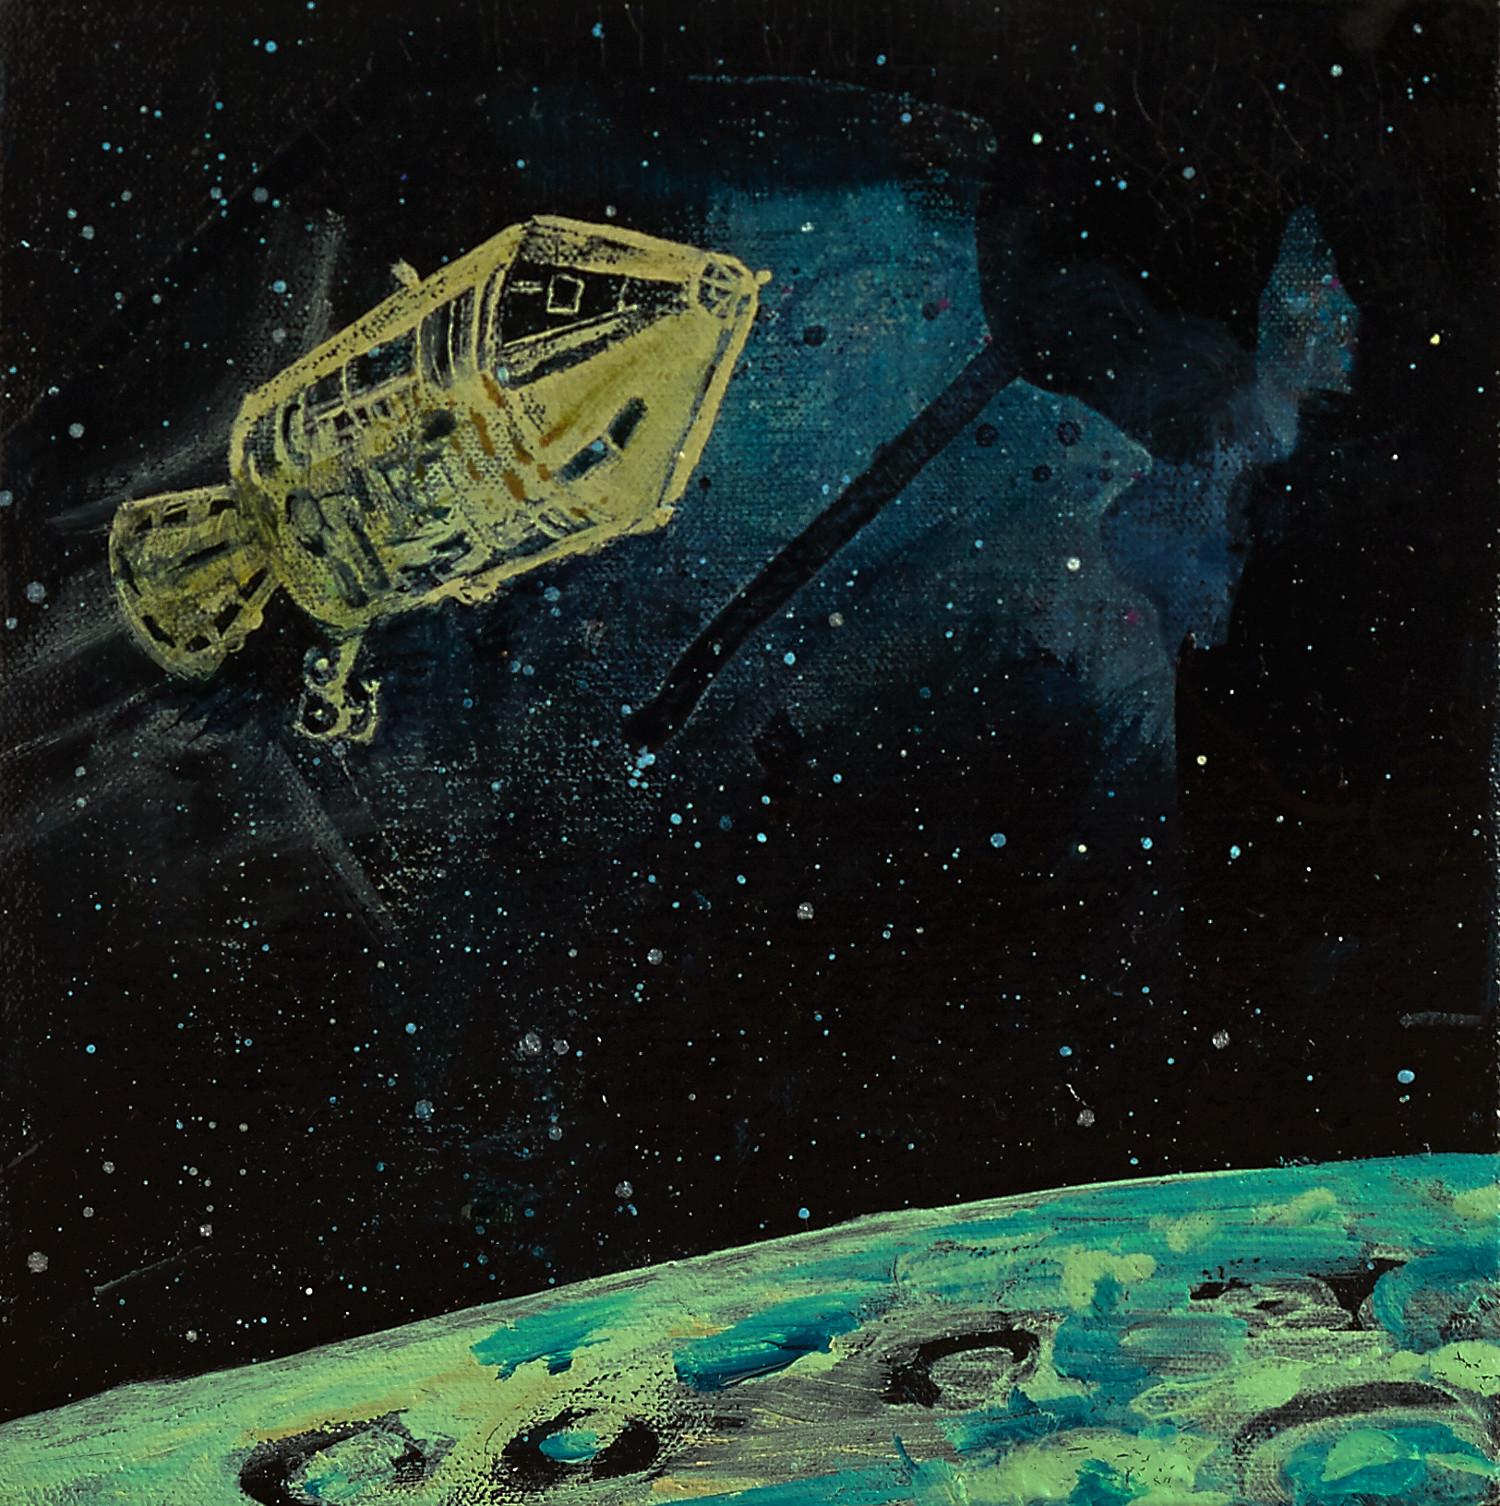 Interstellar, 2015, acrylic, ink, polyurethane resin and oil medium on canvas, 20 x 20cm